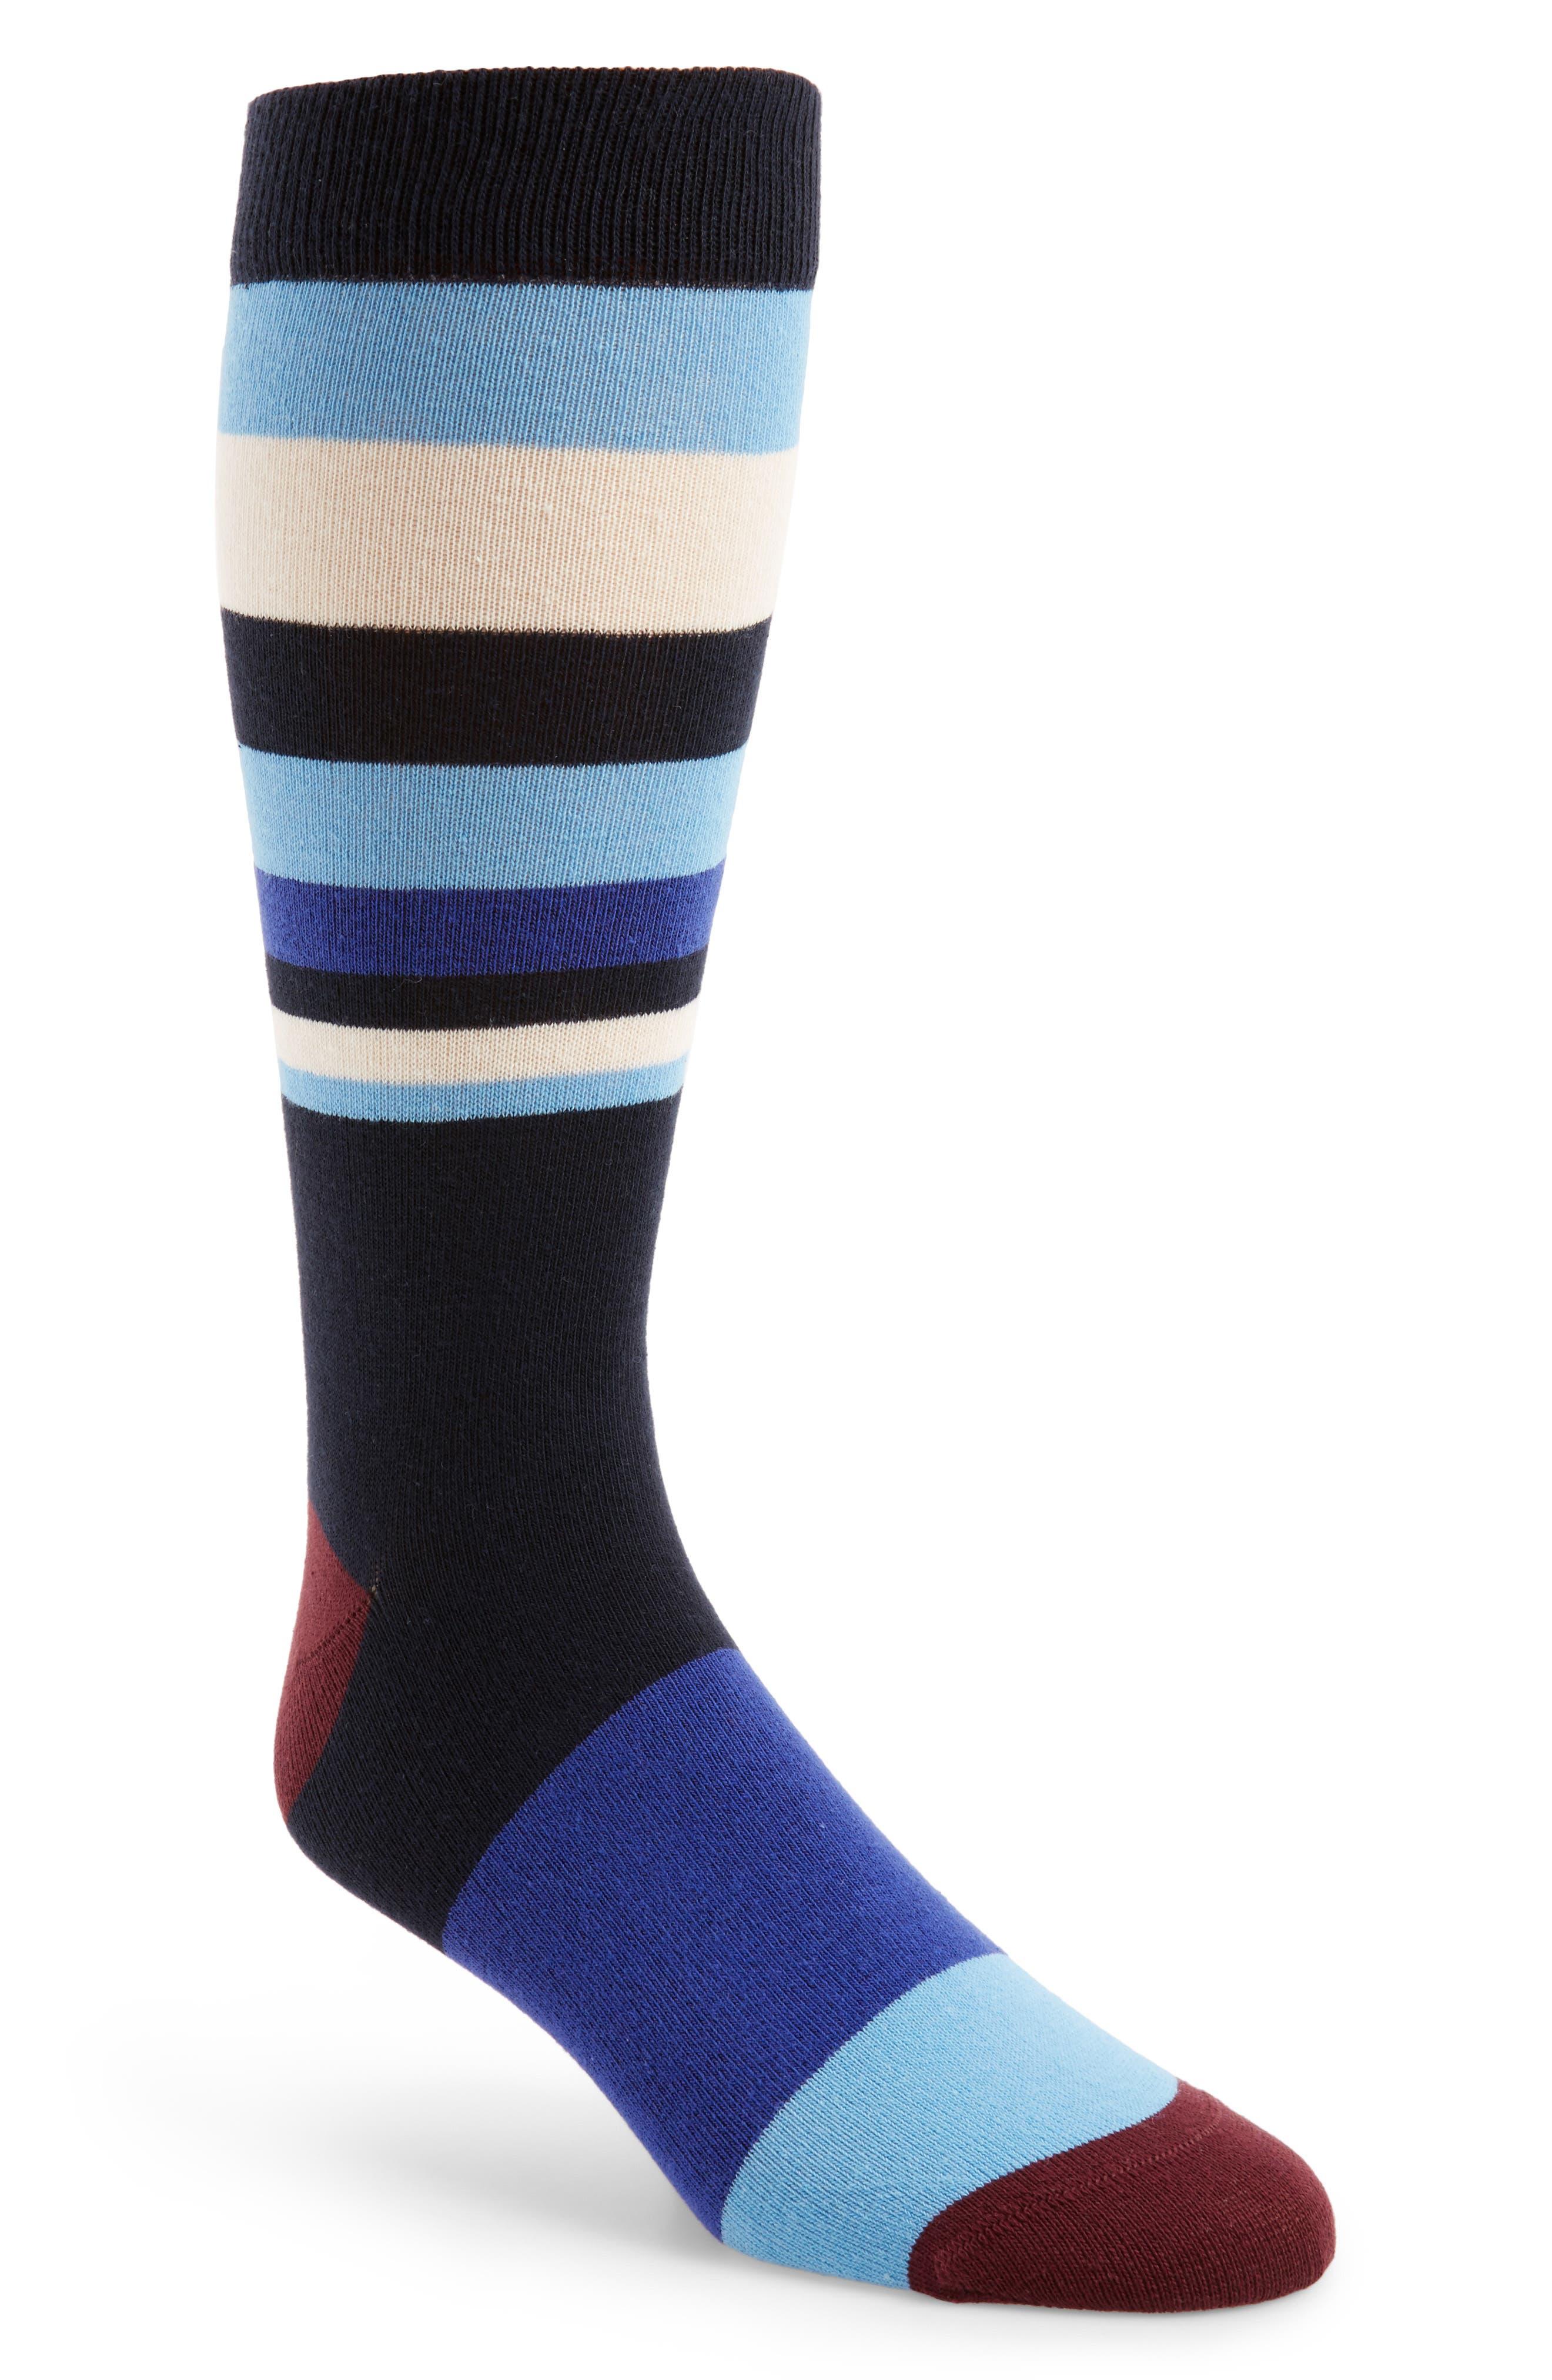 Striped Socks,                             Main thumbnail 1, color,                             410